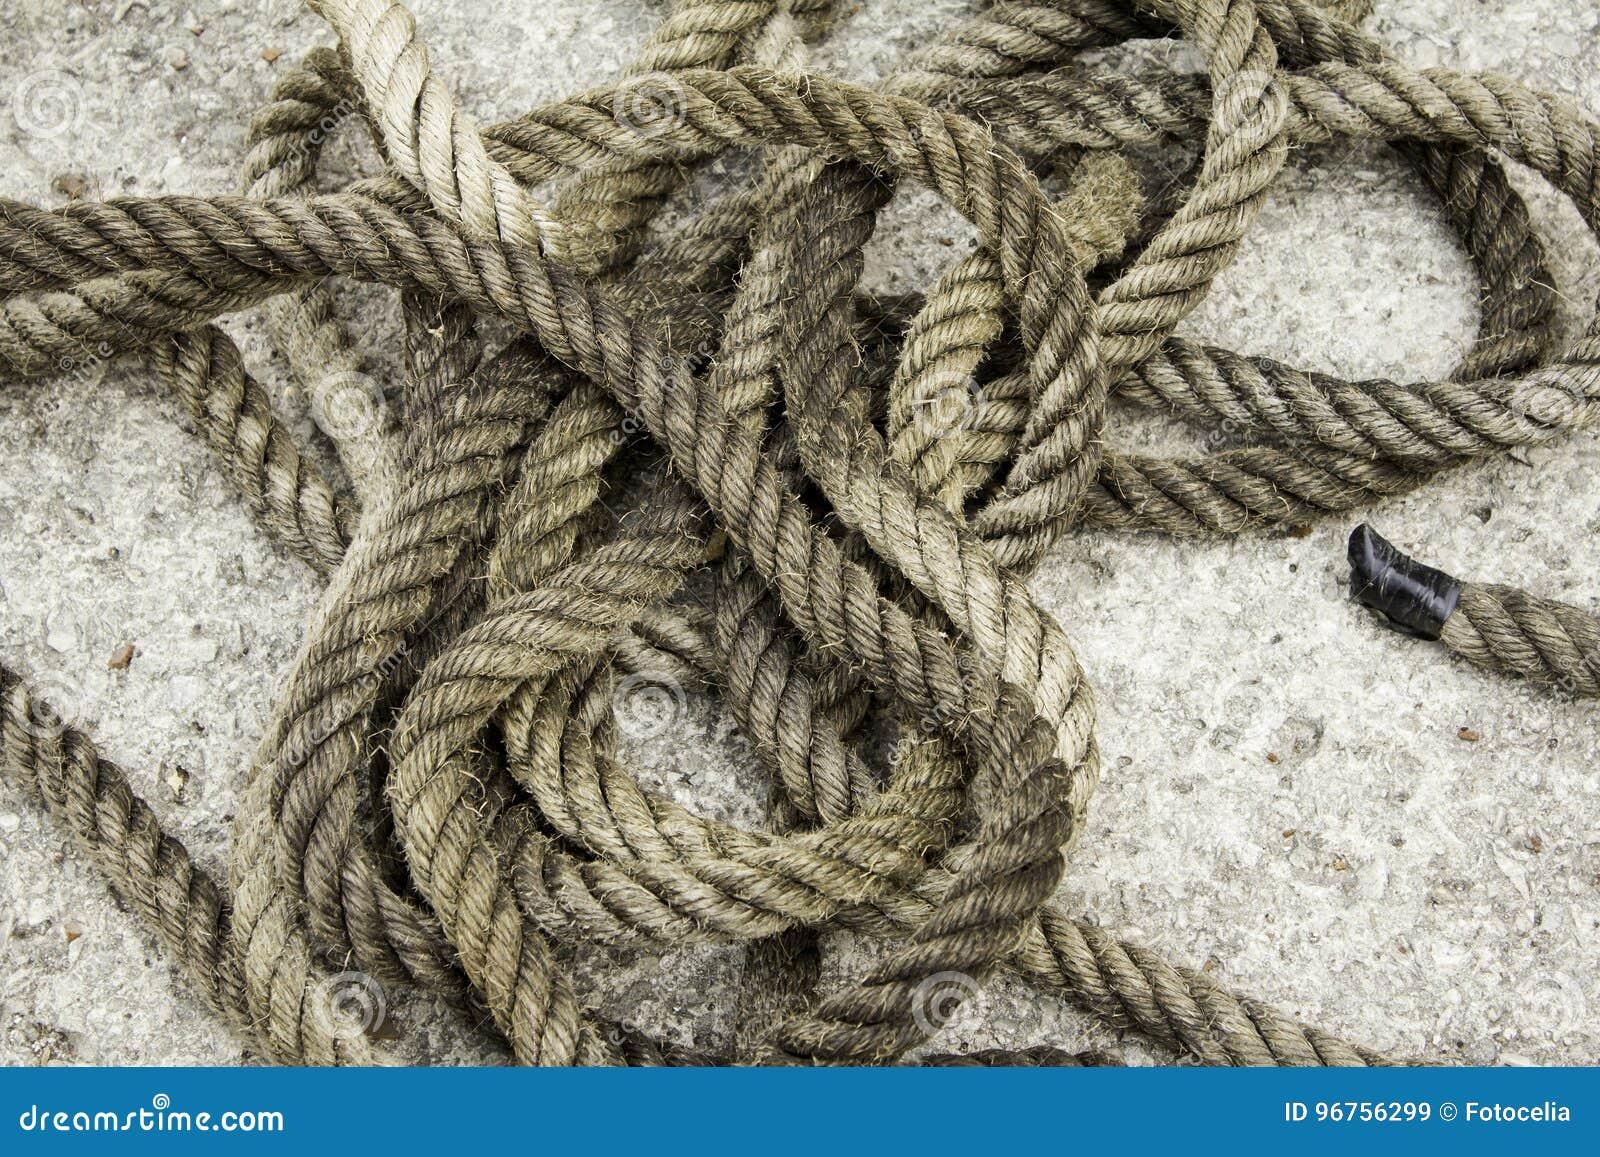 Corde avec des noeuds de fibre